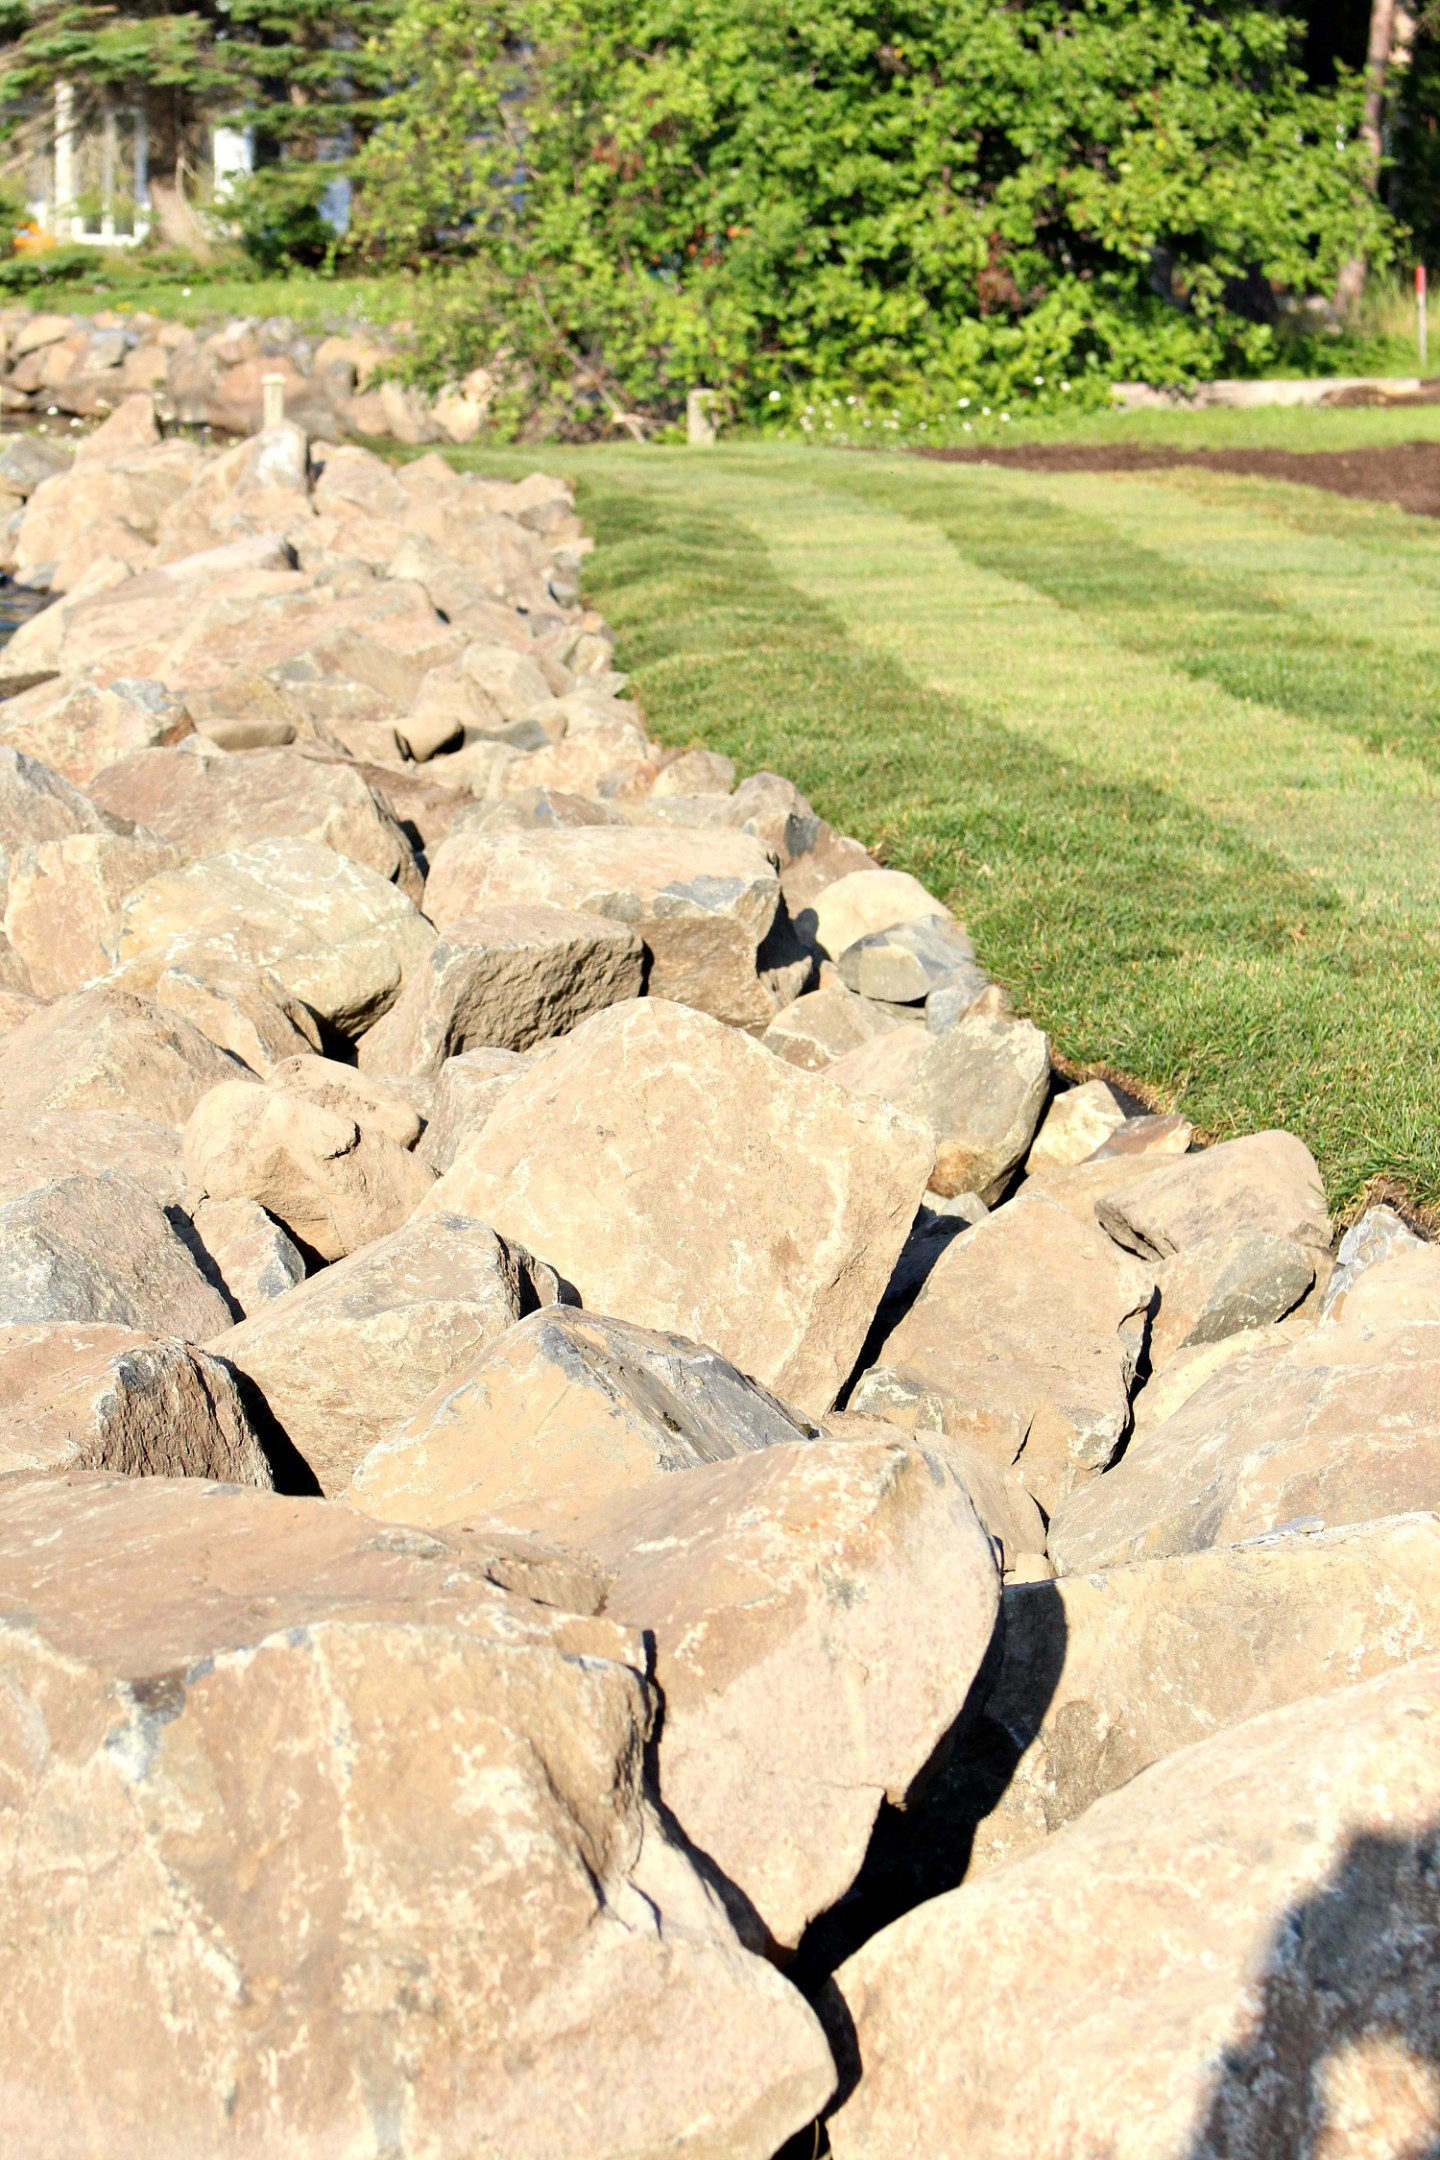 How to Prevent Shore Erosion